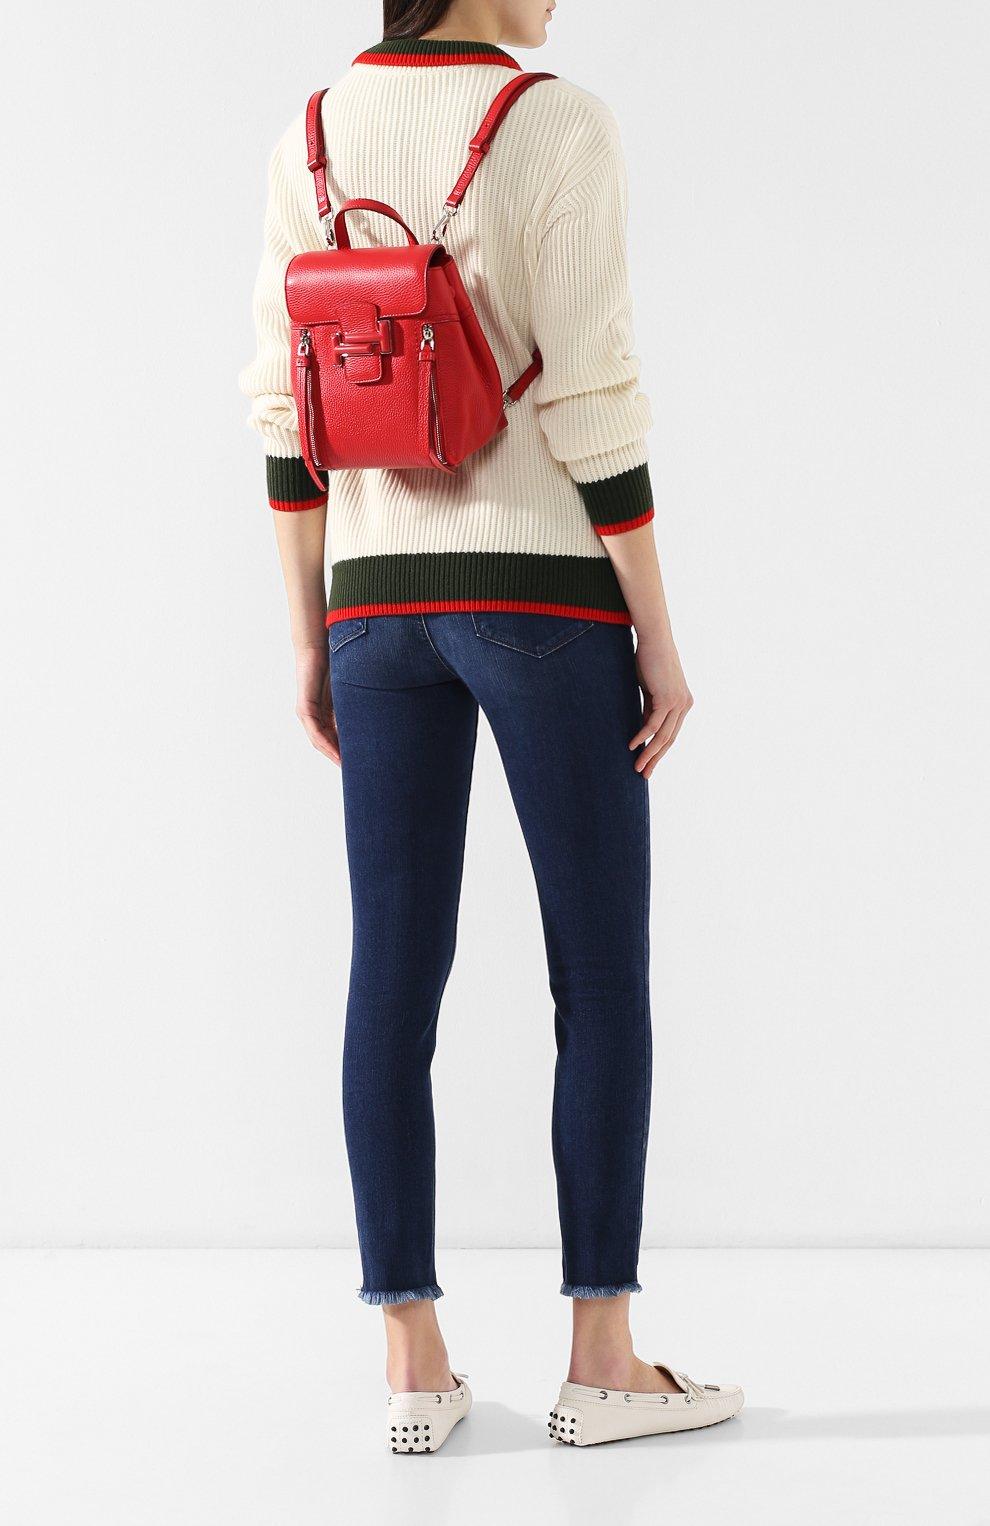 Рюкзак Double T Tod's красный | Фото №2